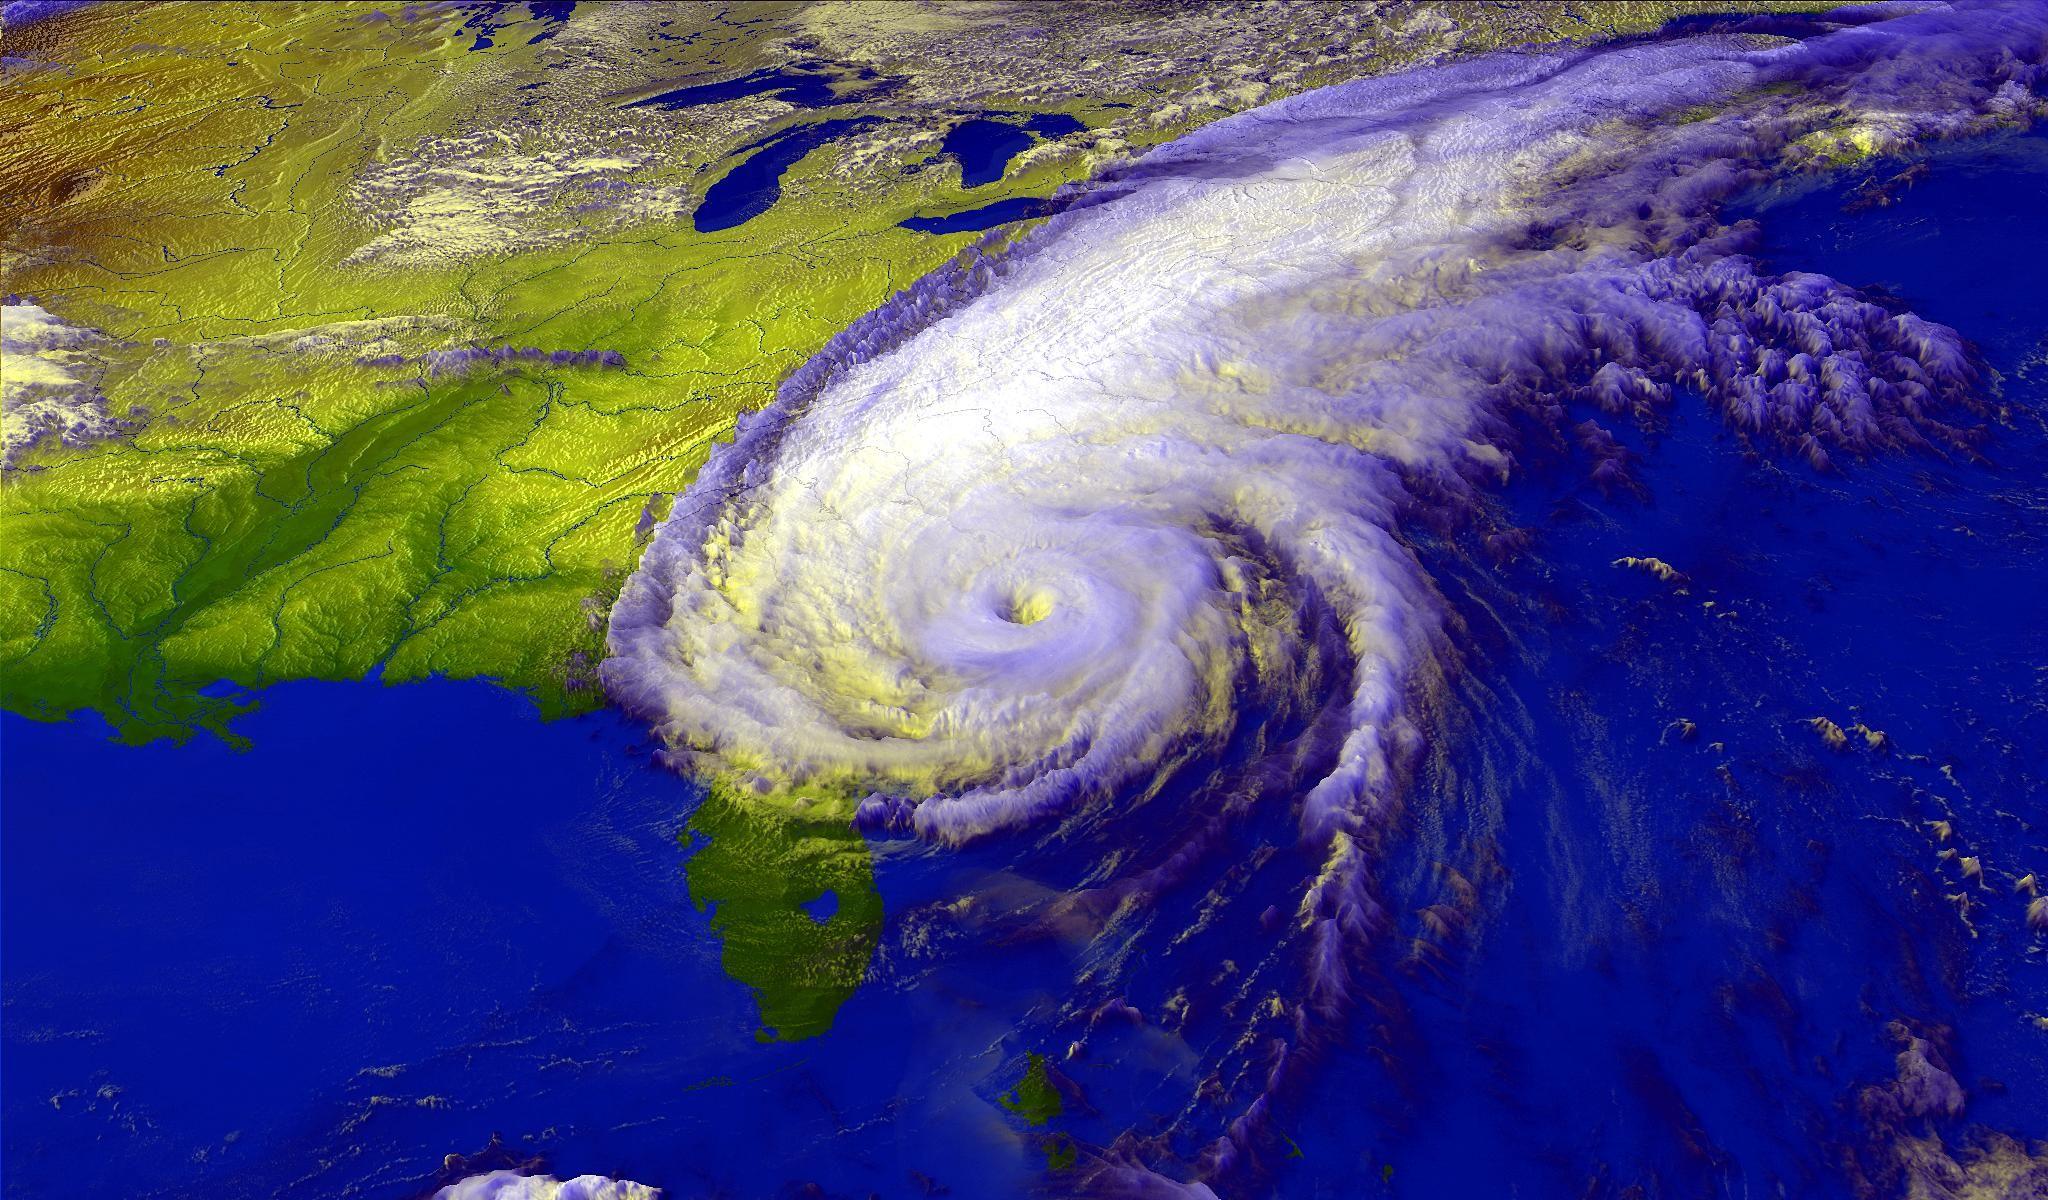 Hurricane Floyd S Lasting Legacy North Carolina Digital History Hurricane Floyd Hurricane Digital History